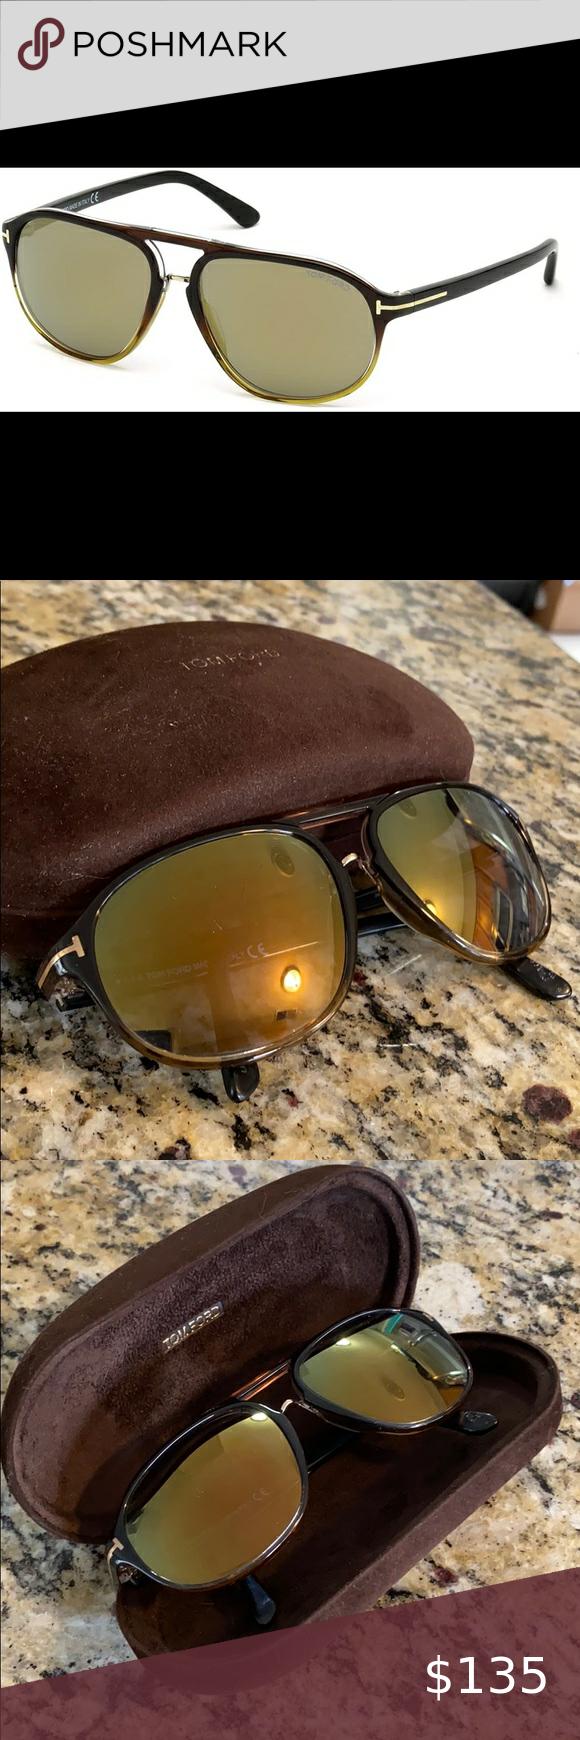 Tom Ford 447 Jacob Sunglasses 🕶 Unisex